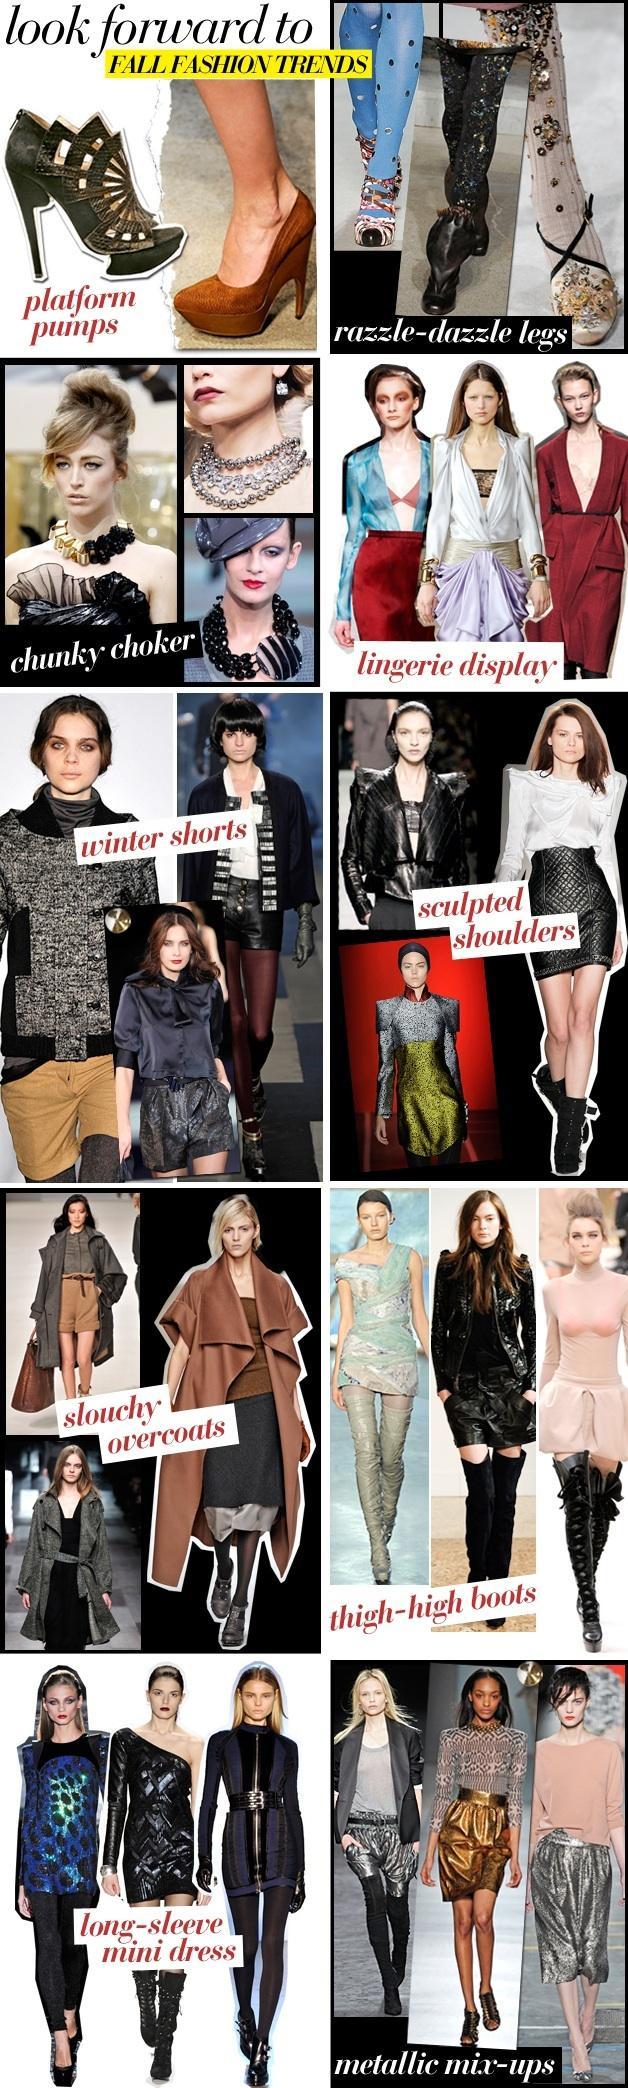 Fall 09 Fashion Trends